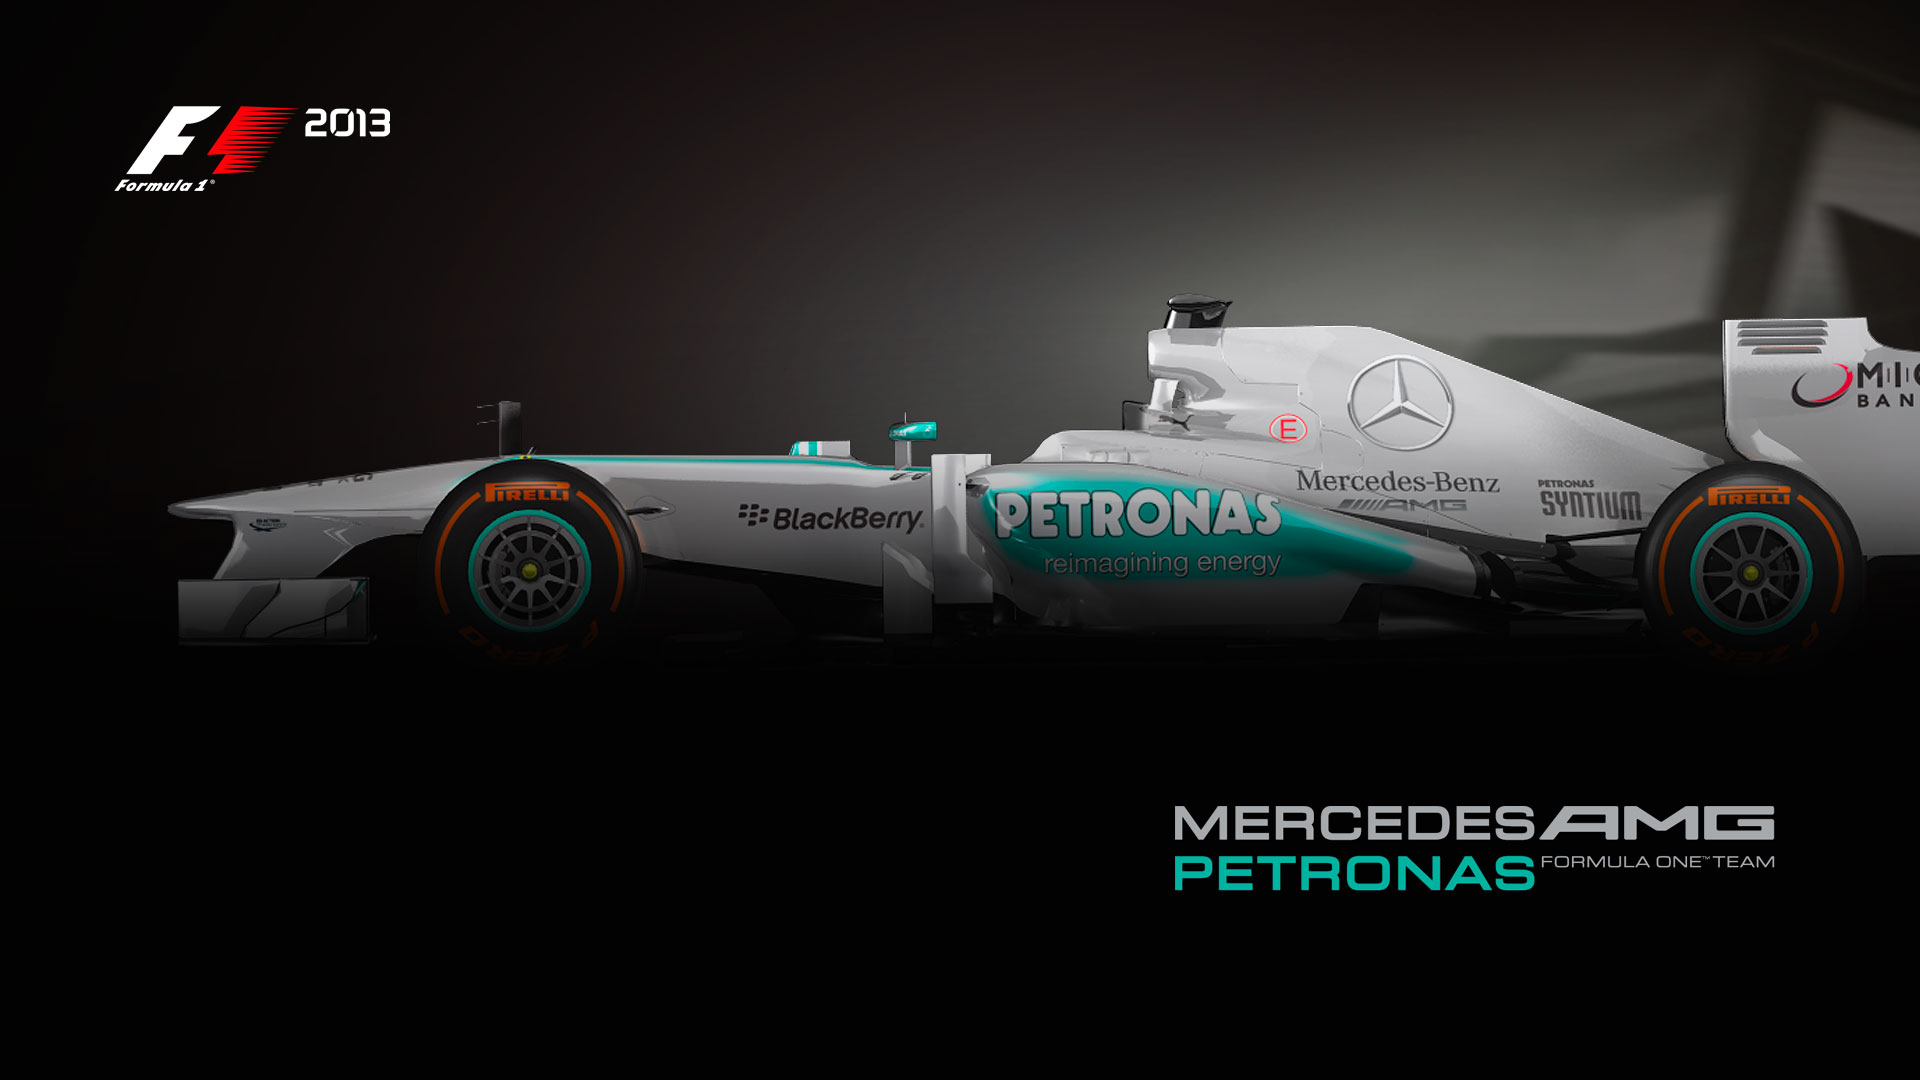 Mercedes AMG Petronas F Team